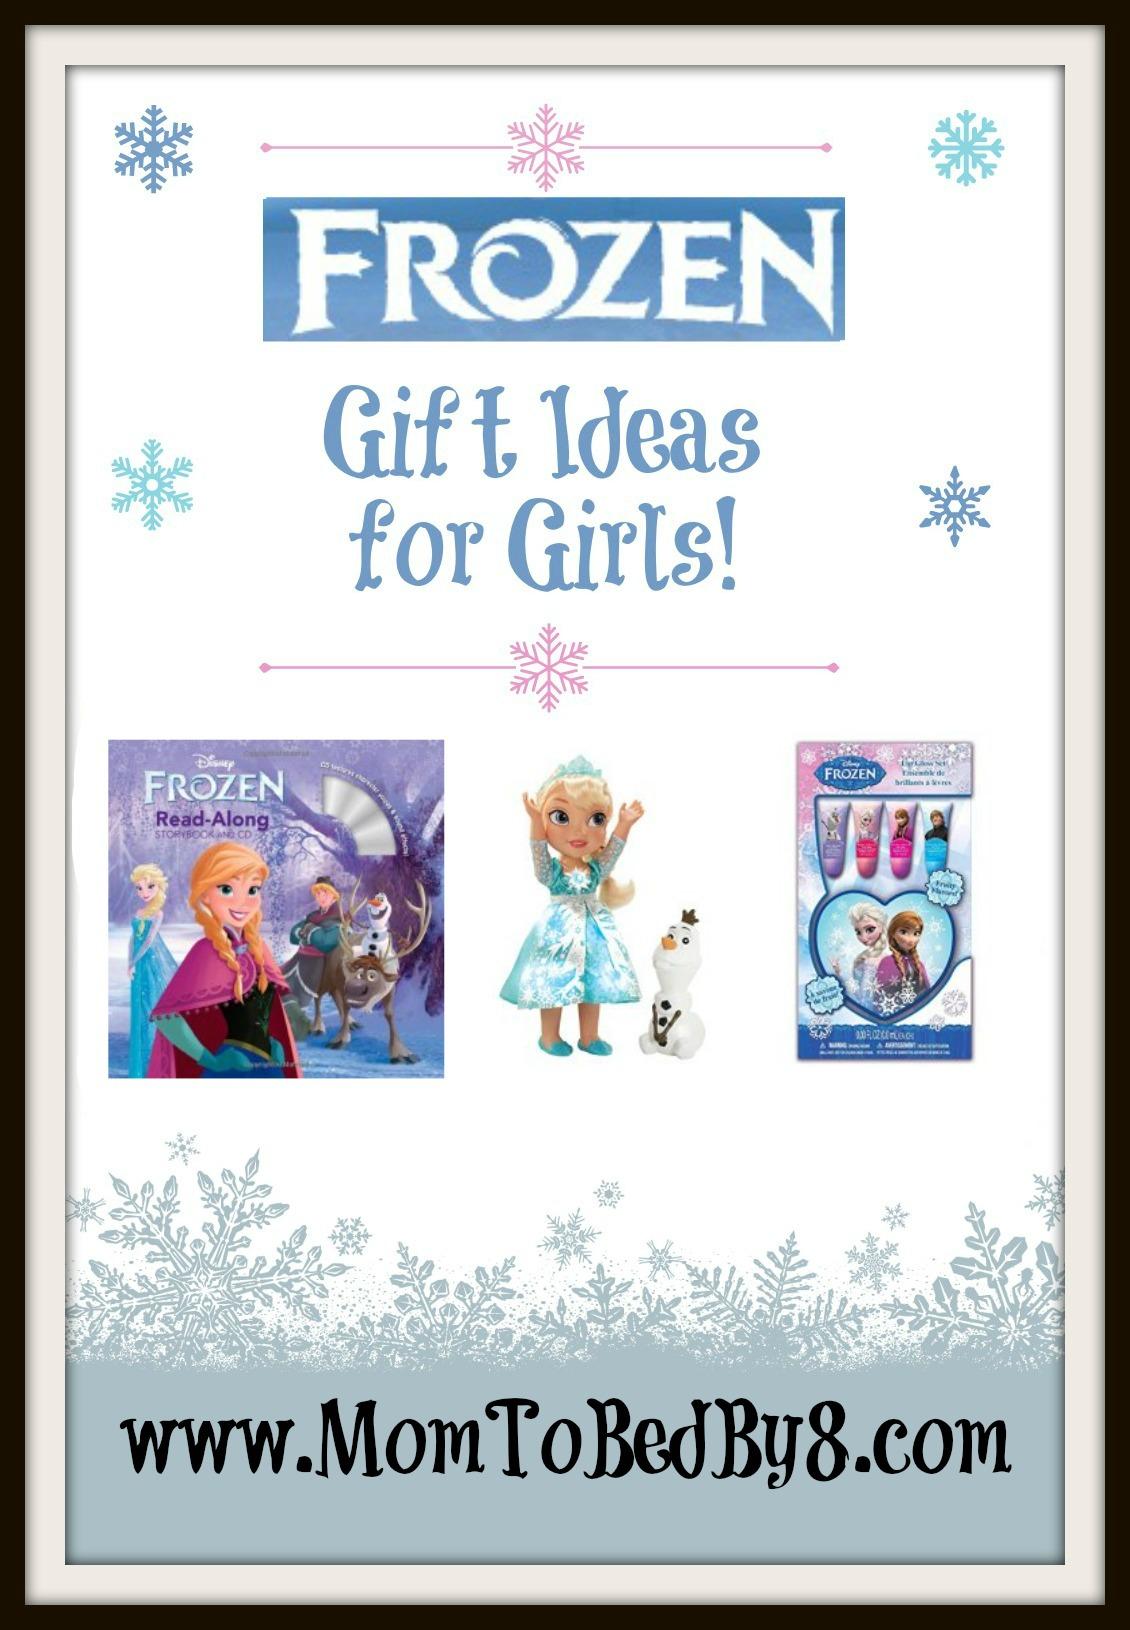 Last Minute Frozen Gift Ideas for Girls